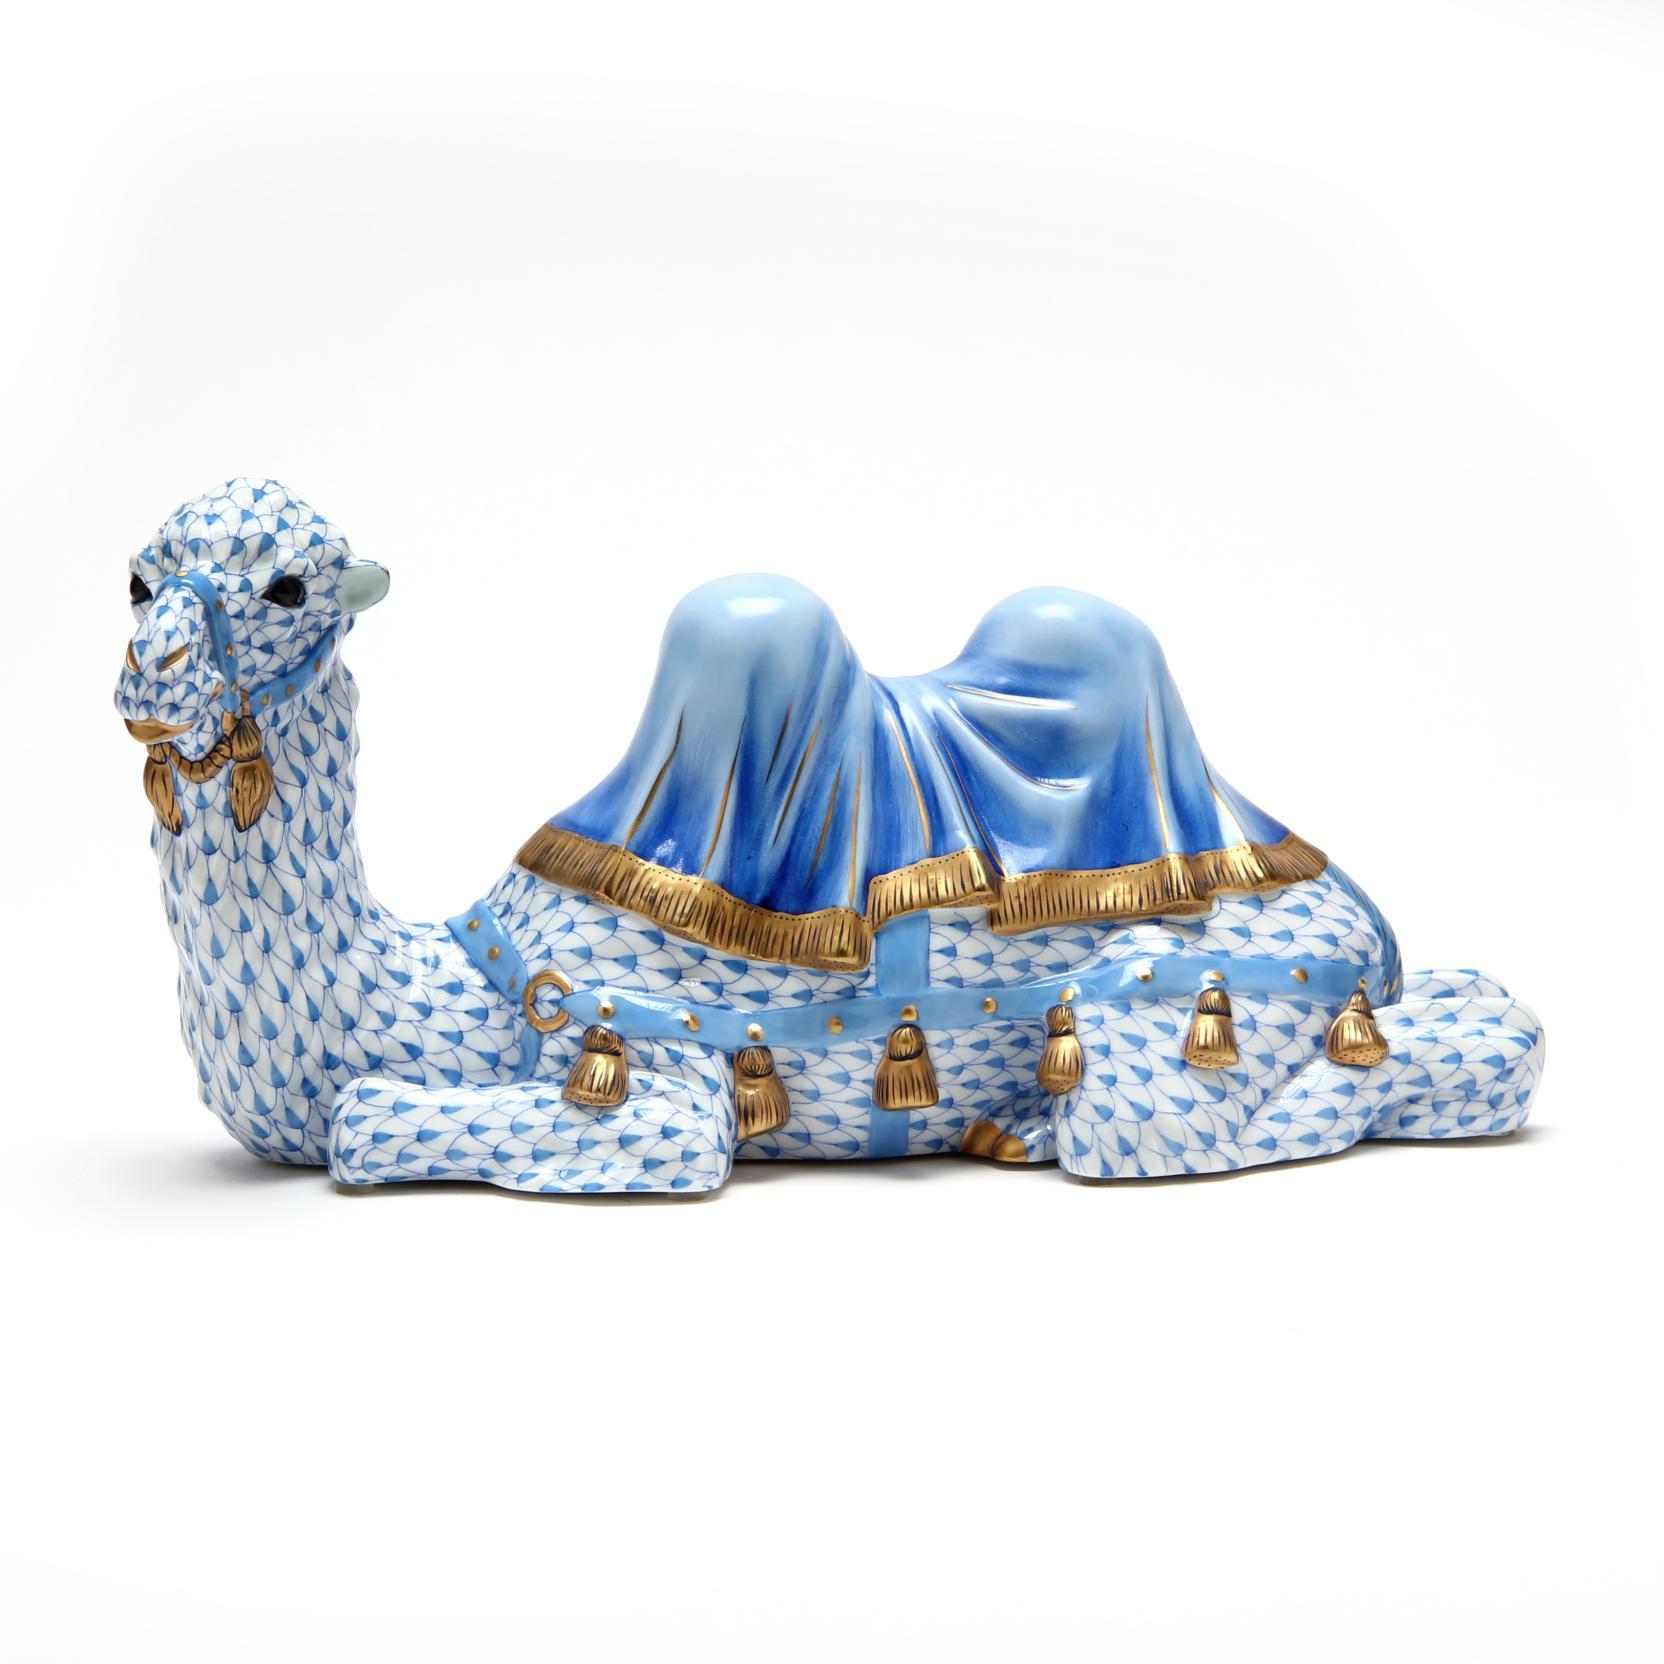 a-herend-figurine-of-a-dromedary-camel